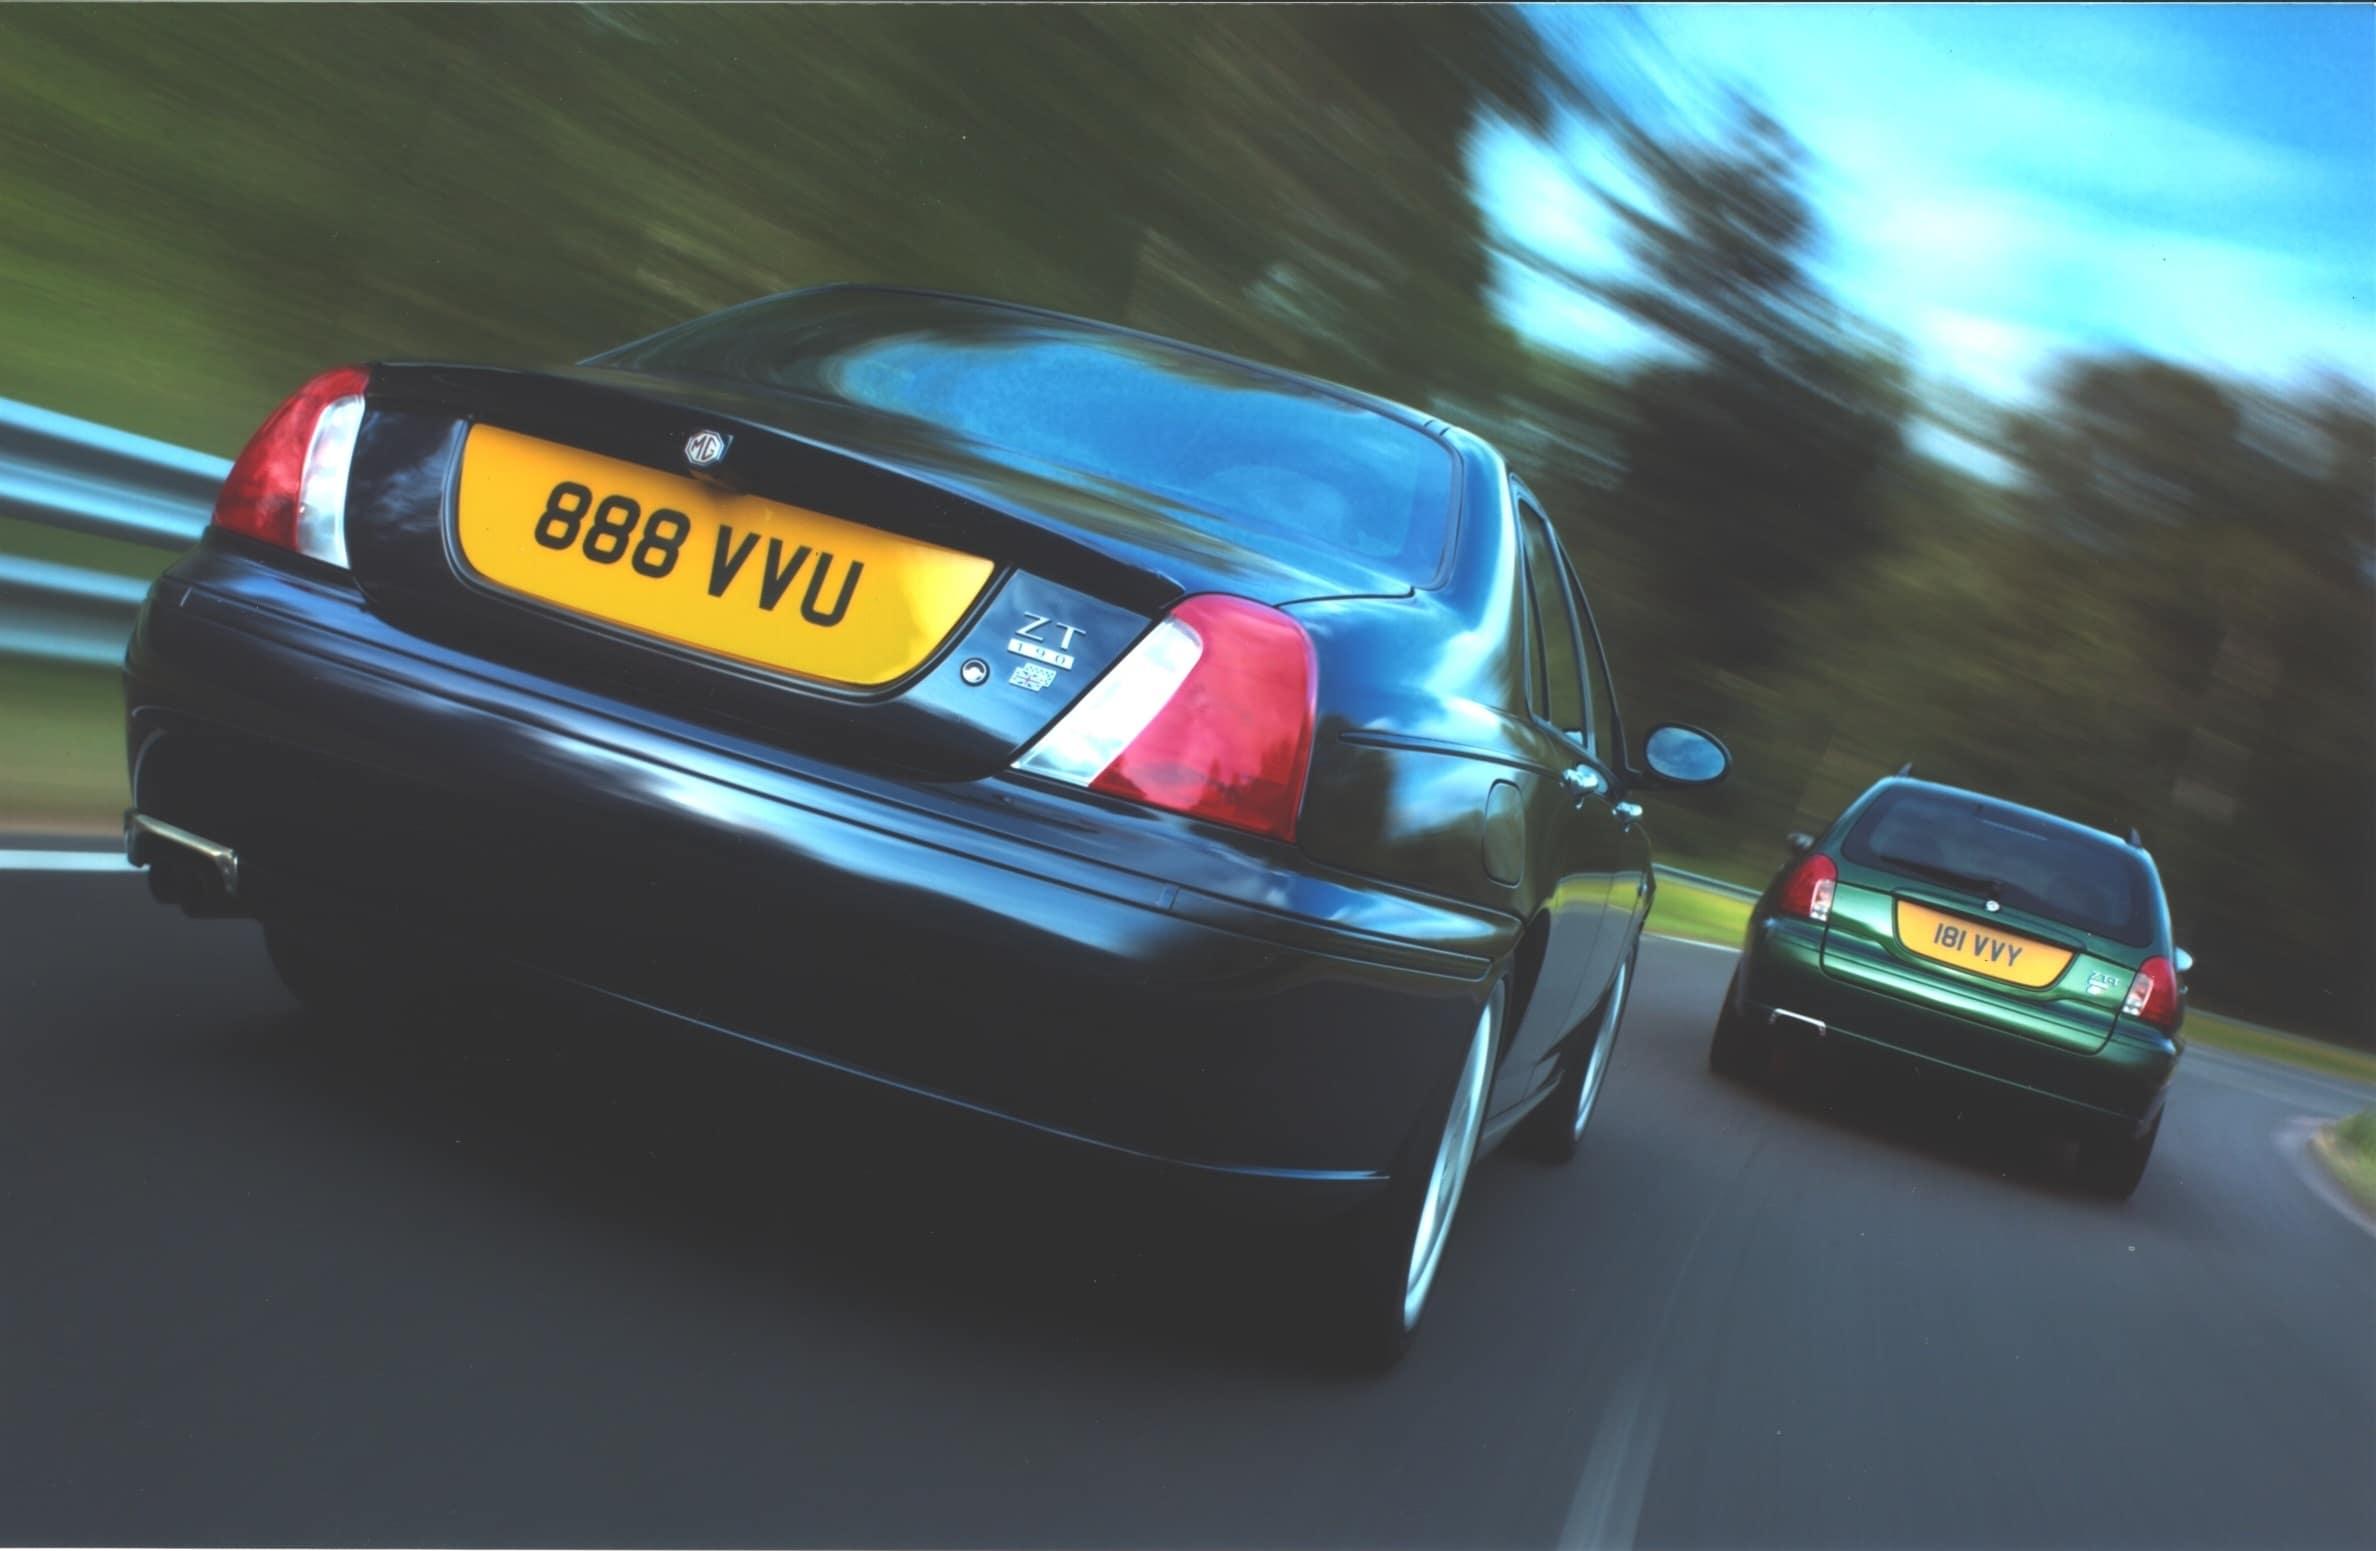 mg zs 180, mg, mg zs, rover, btcc, cars, motoring, automotive, v6, performance car, retro car, classic car, car, classic, retro, motorsport, rob collard, longbridge, uk, police car, mg zt, zt, zt-t